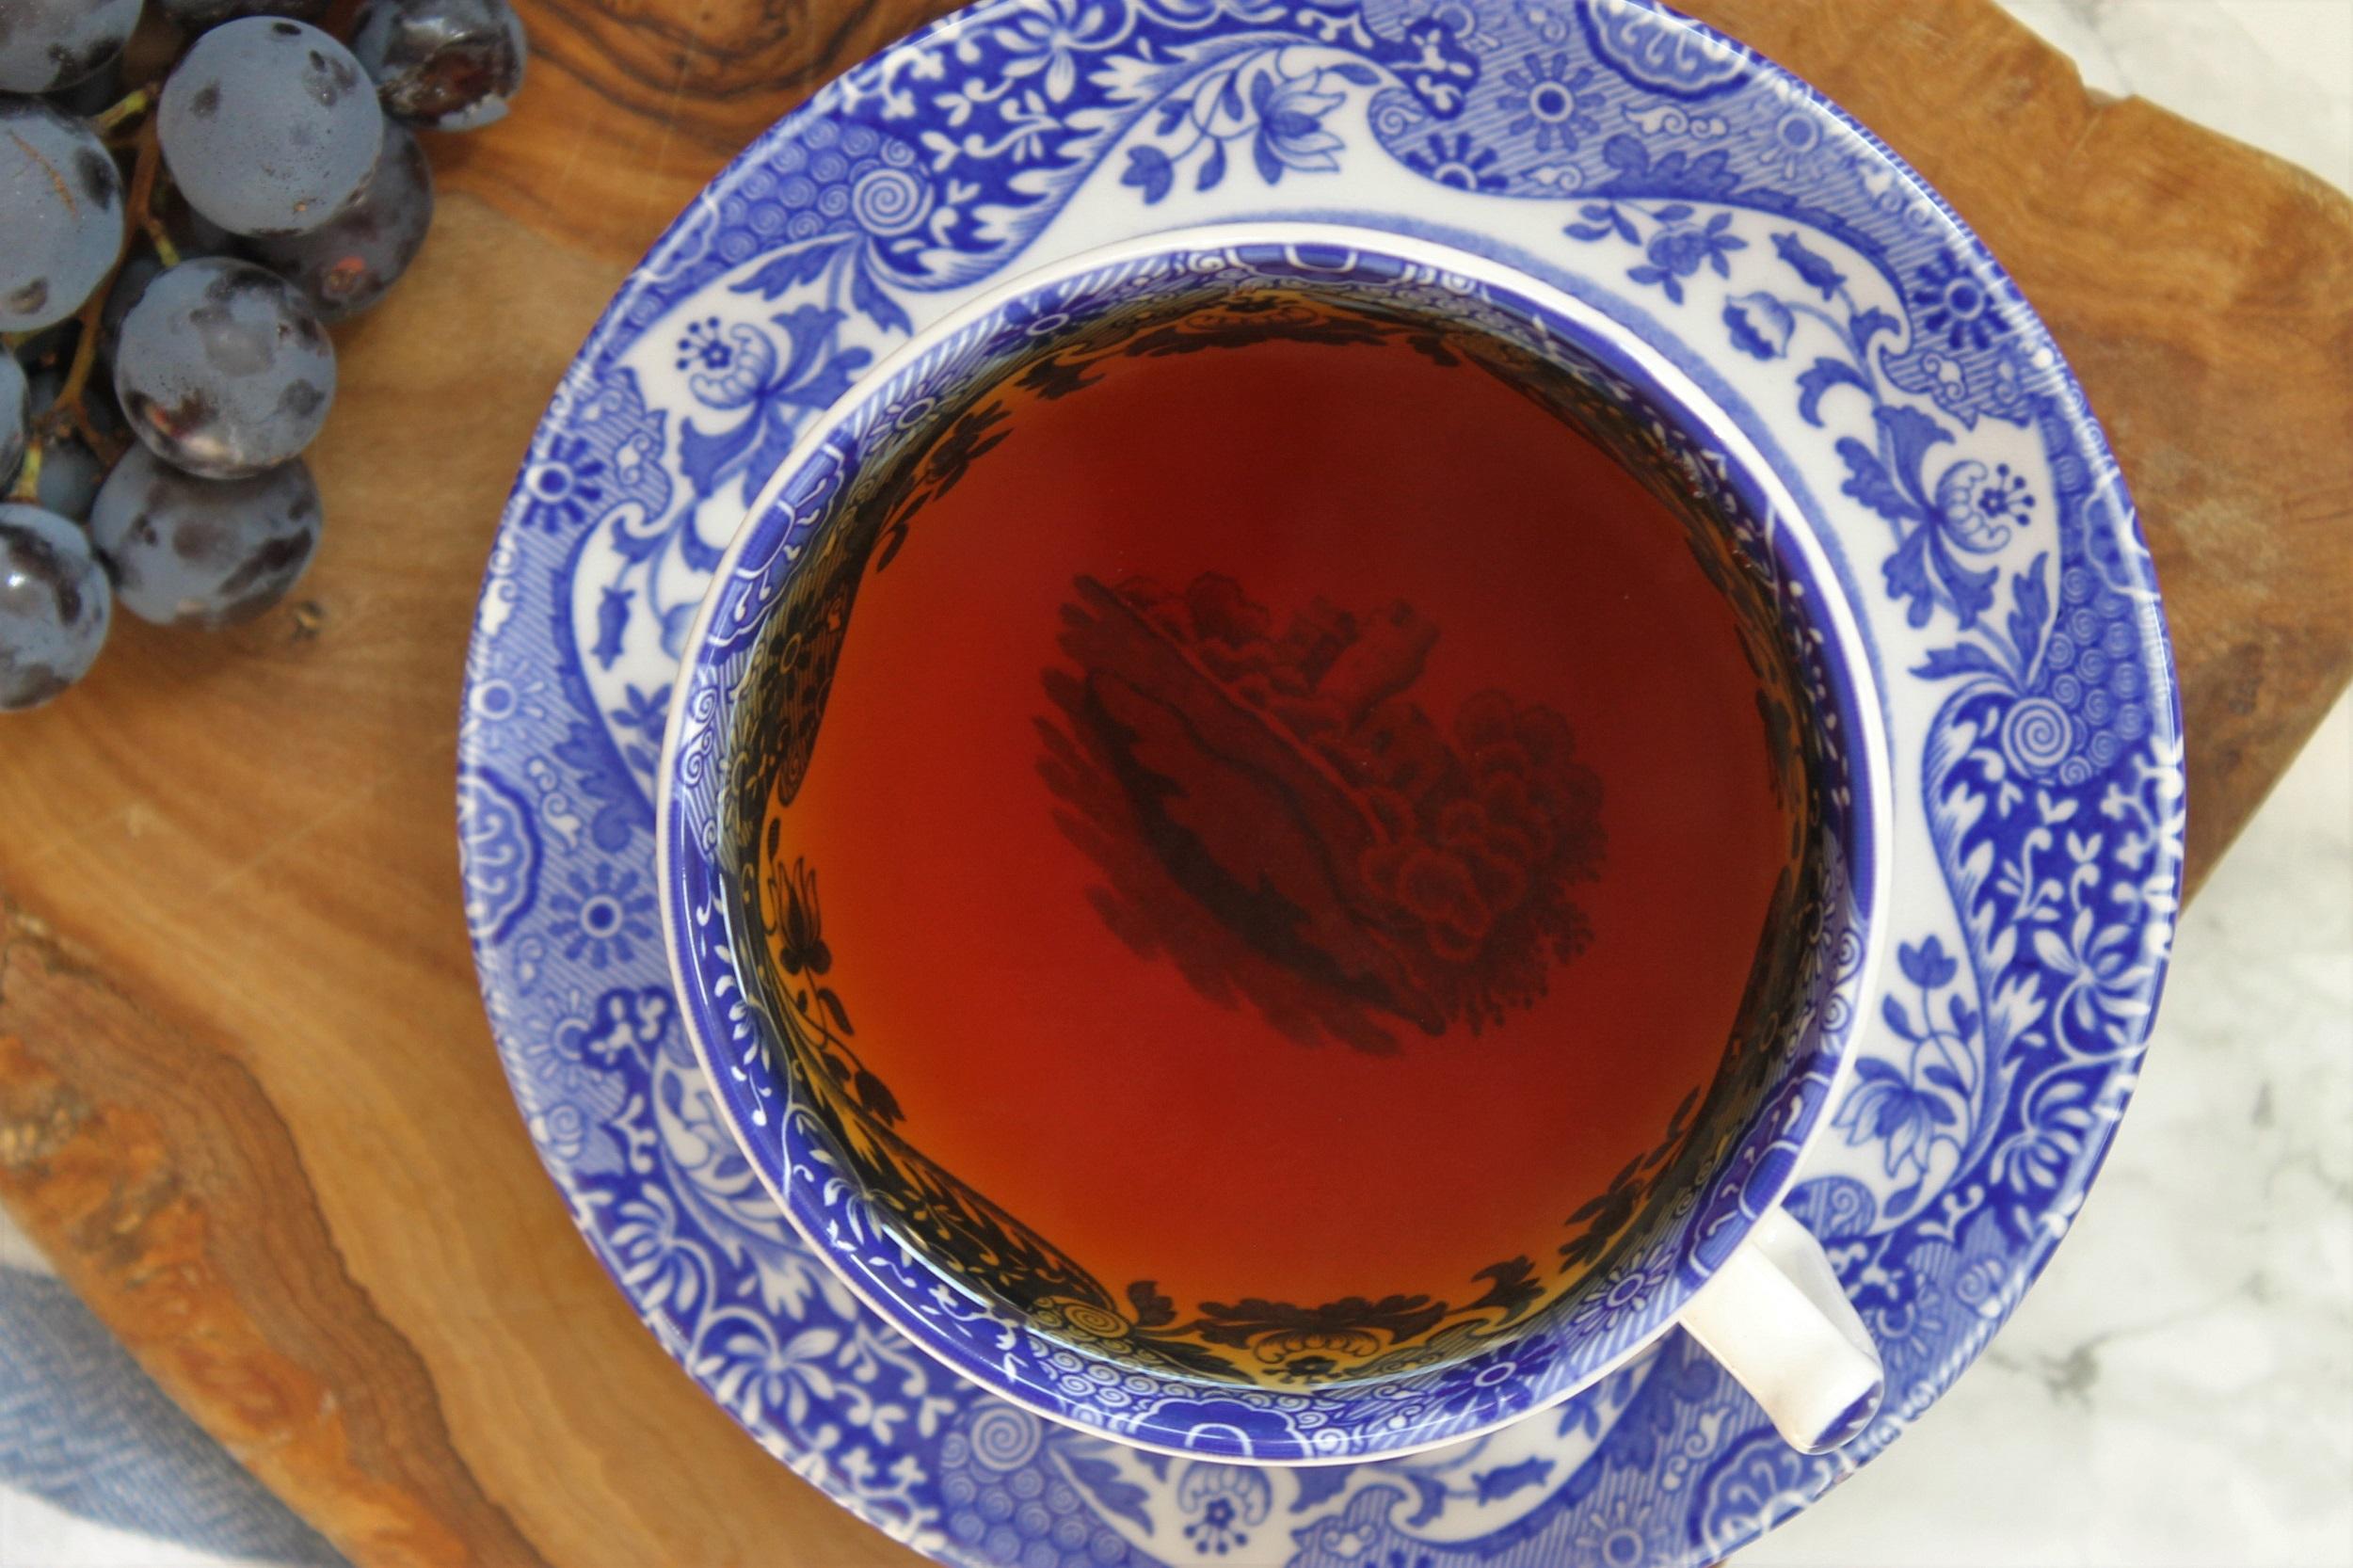 earl grey in willow pattern blue teacup